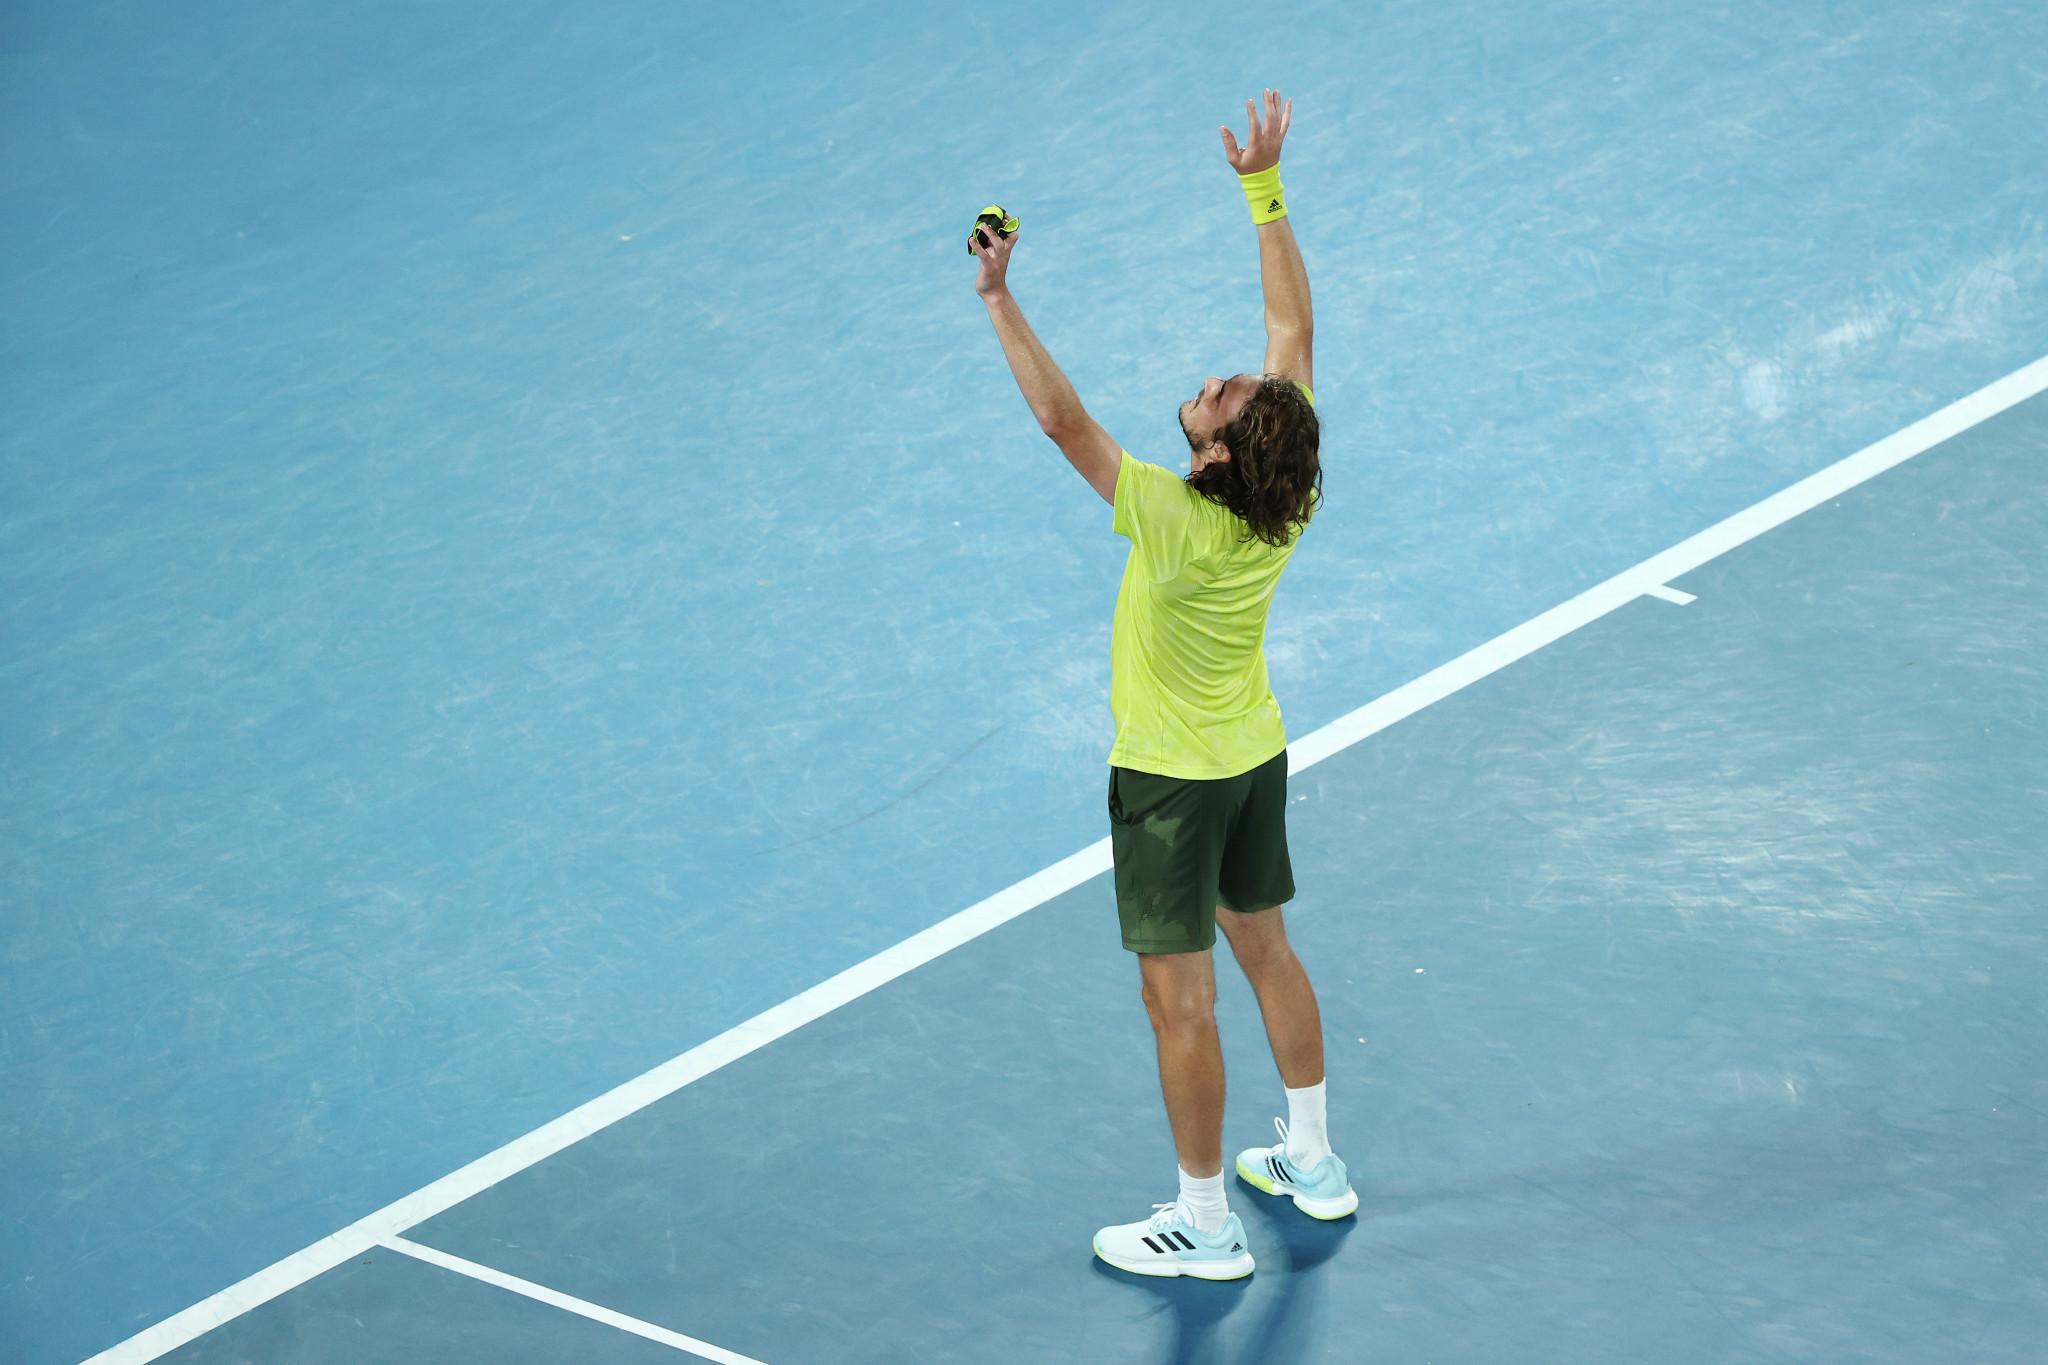 Tsitsipas stars on second day of quarter-finals at Australian Open